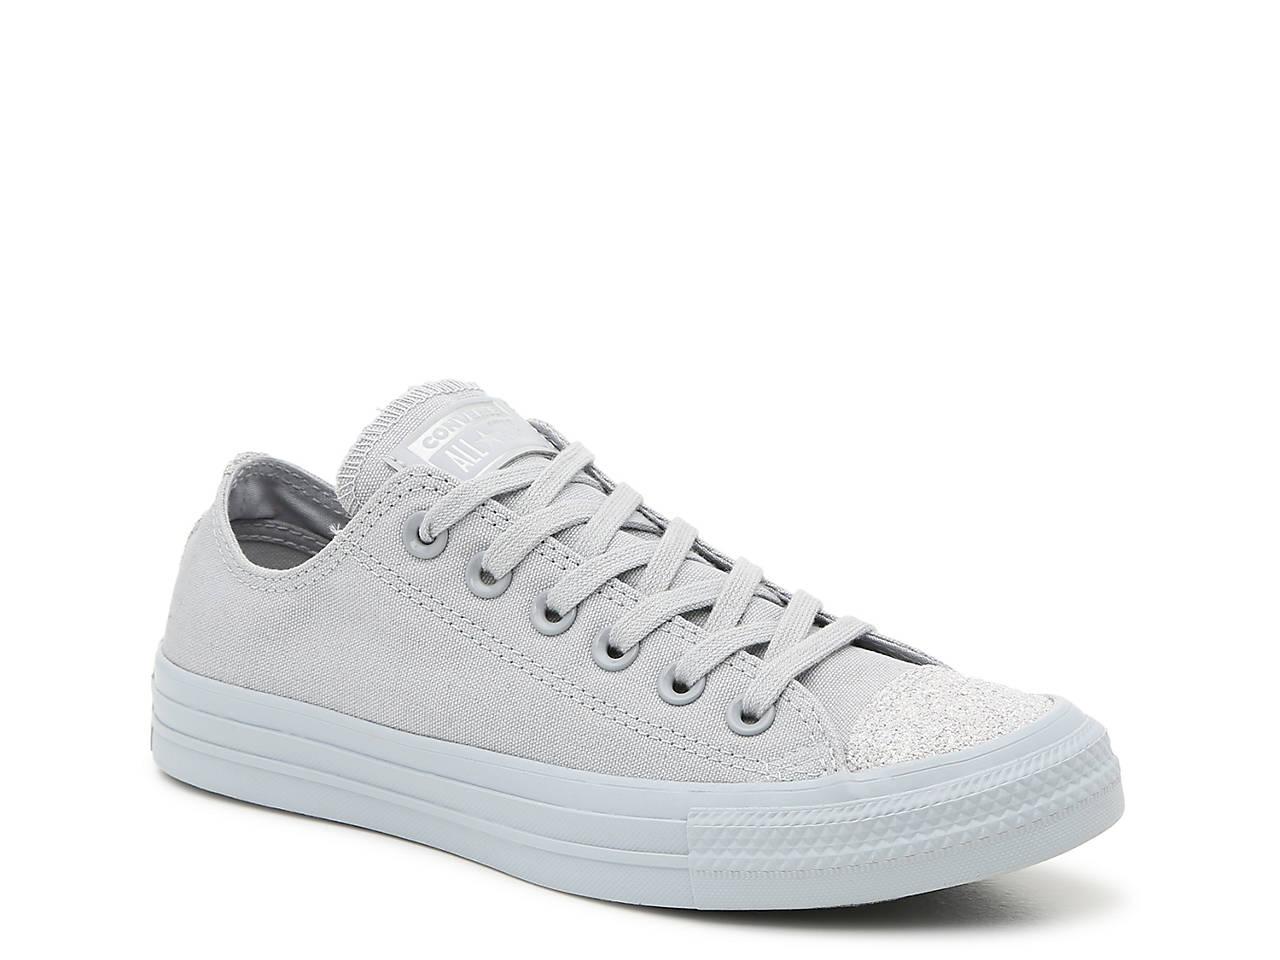 Converse Chuck Taylor All Star Sneaker - Women s Women s Shoes  9189431ea5